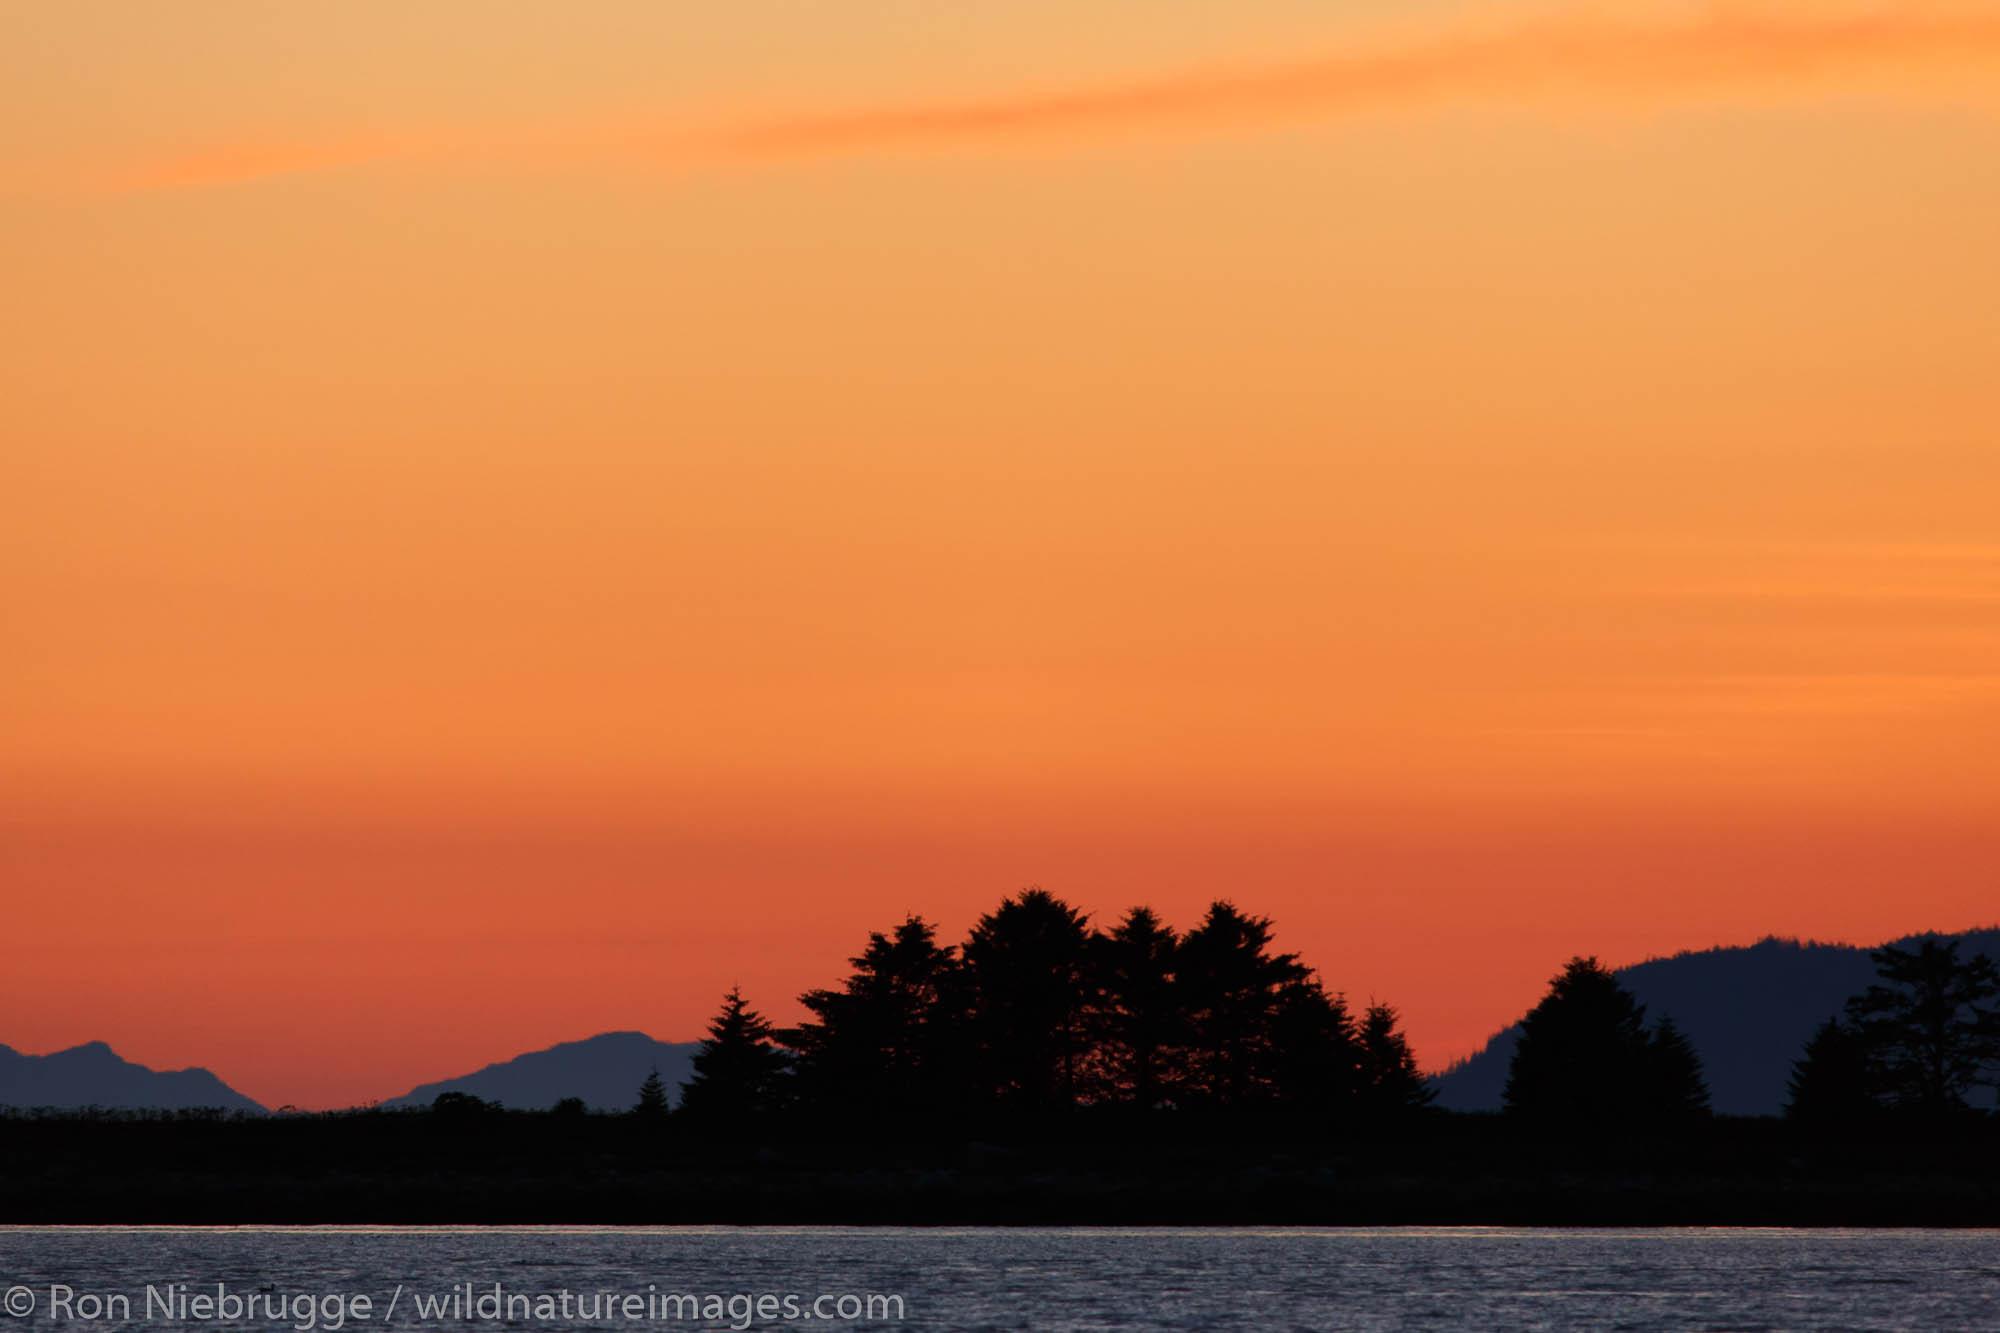 Sunset on Frederick Sound, Tongass National Forest, Alaska.